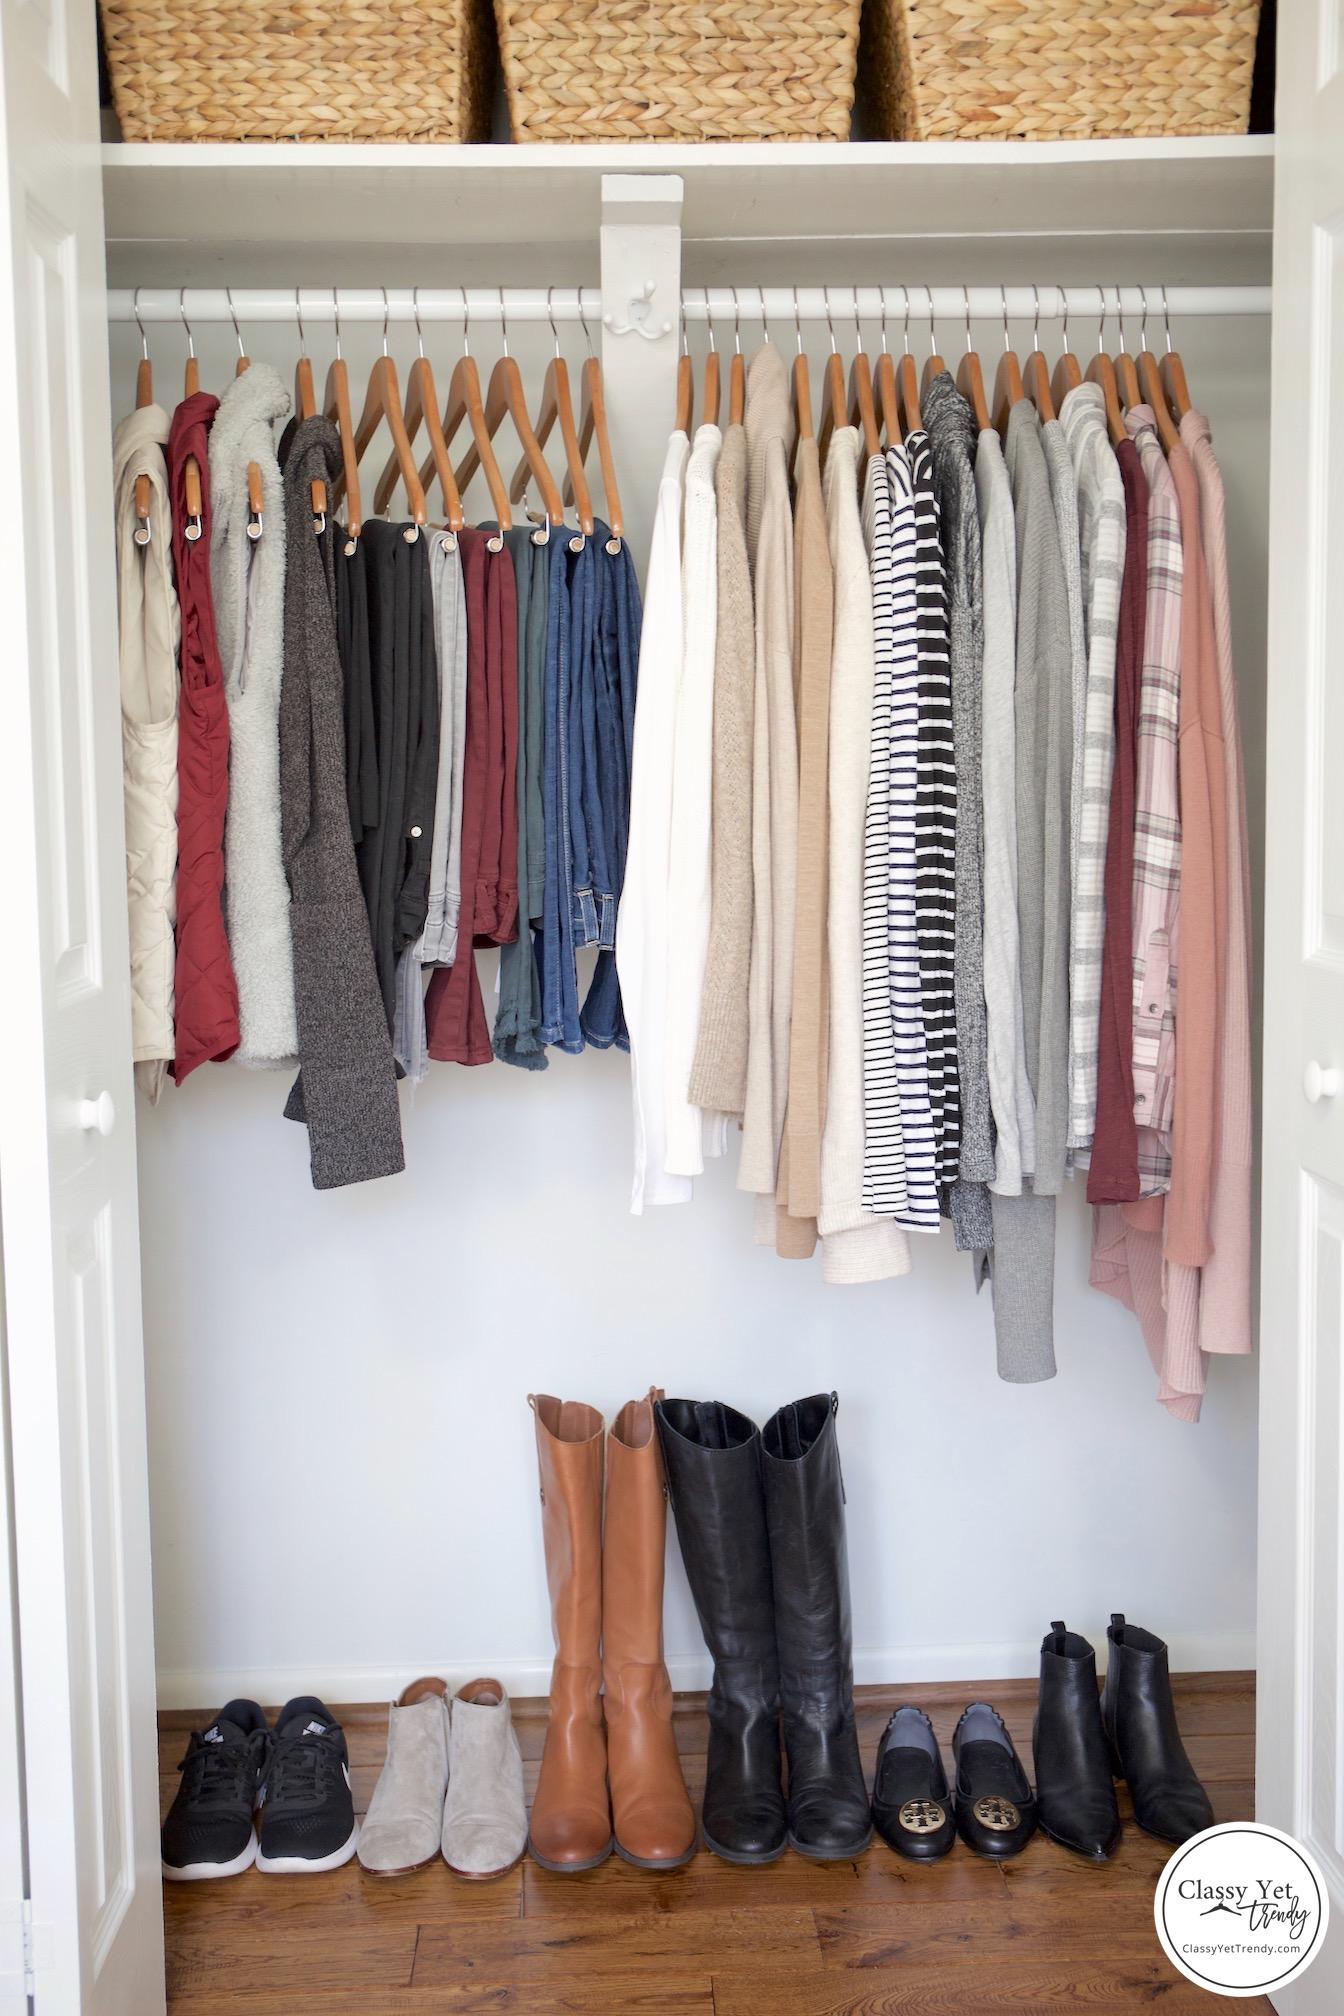 My Winter 2018-2019 Capsule Wardrobe - full closet